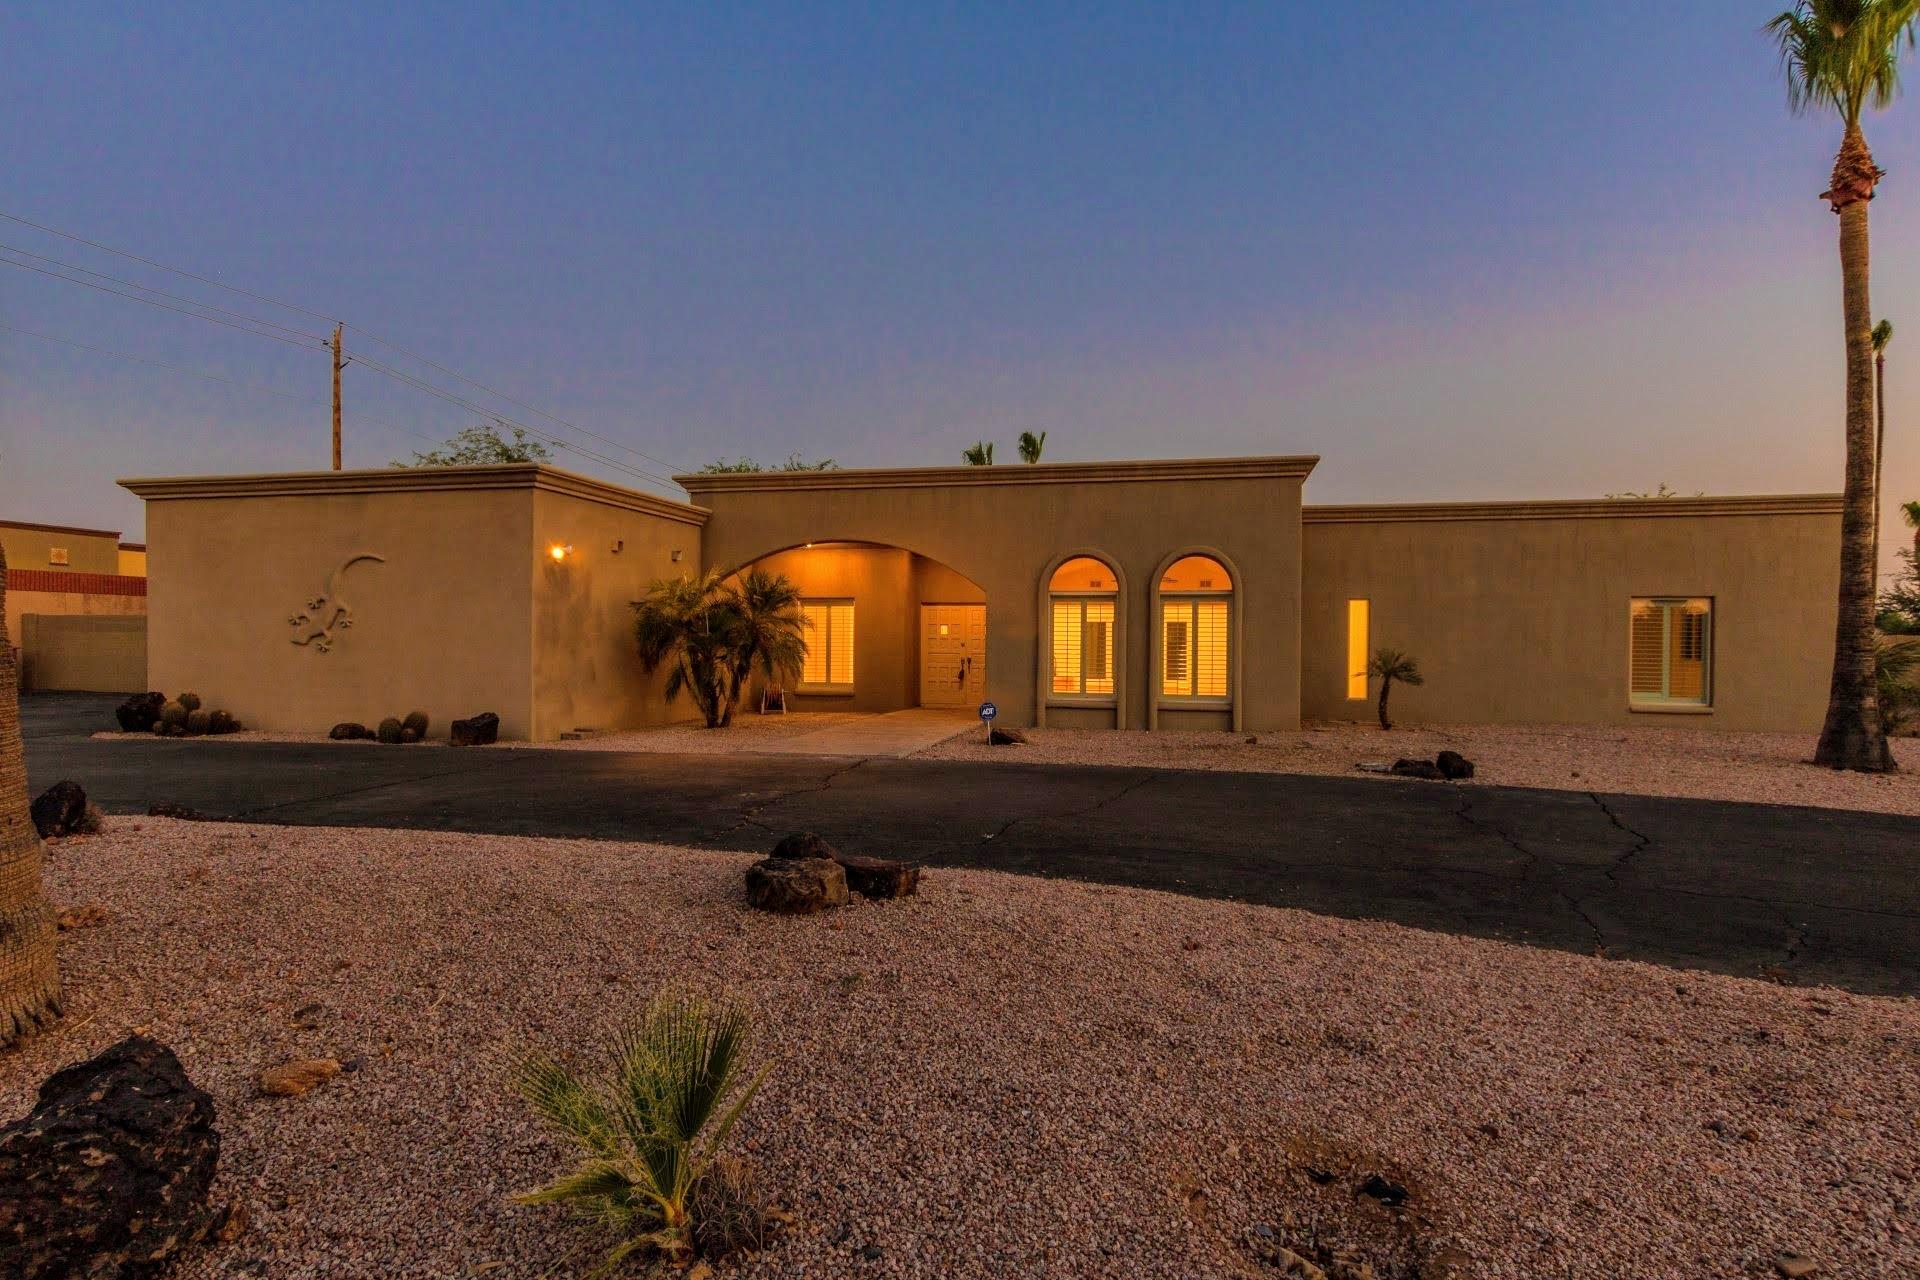 8735 E Joshua Tree Ln, Scottsdale, AZ 85250.jpg